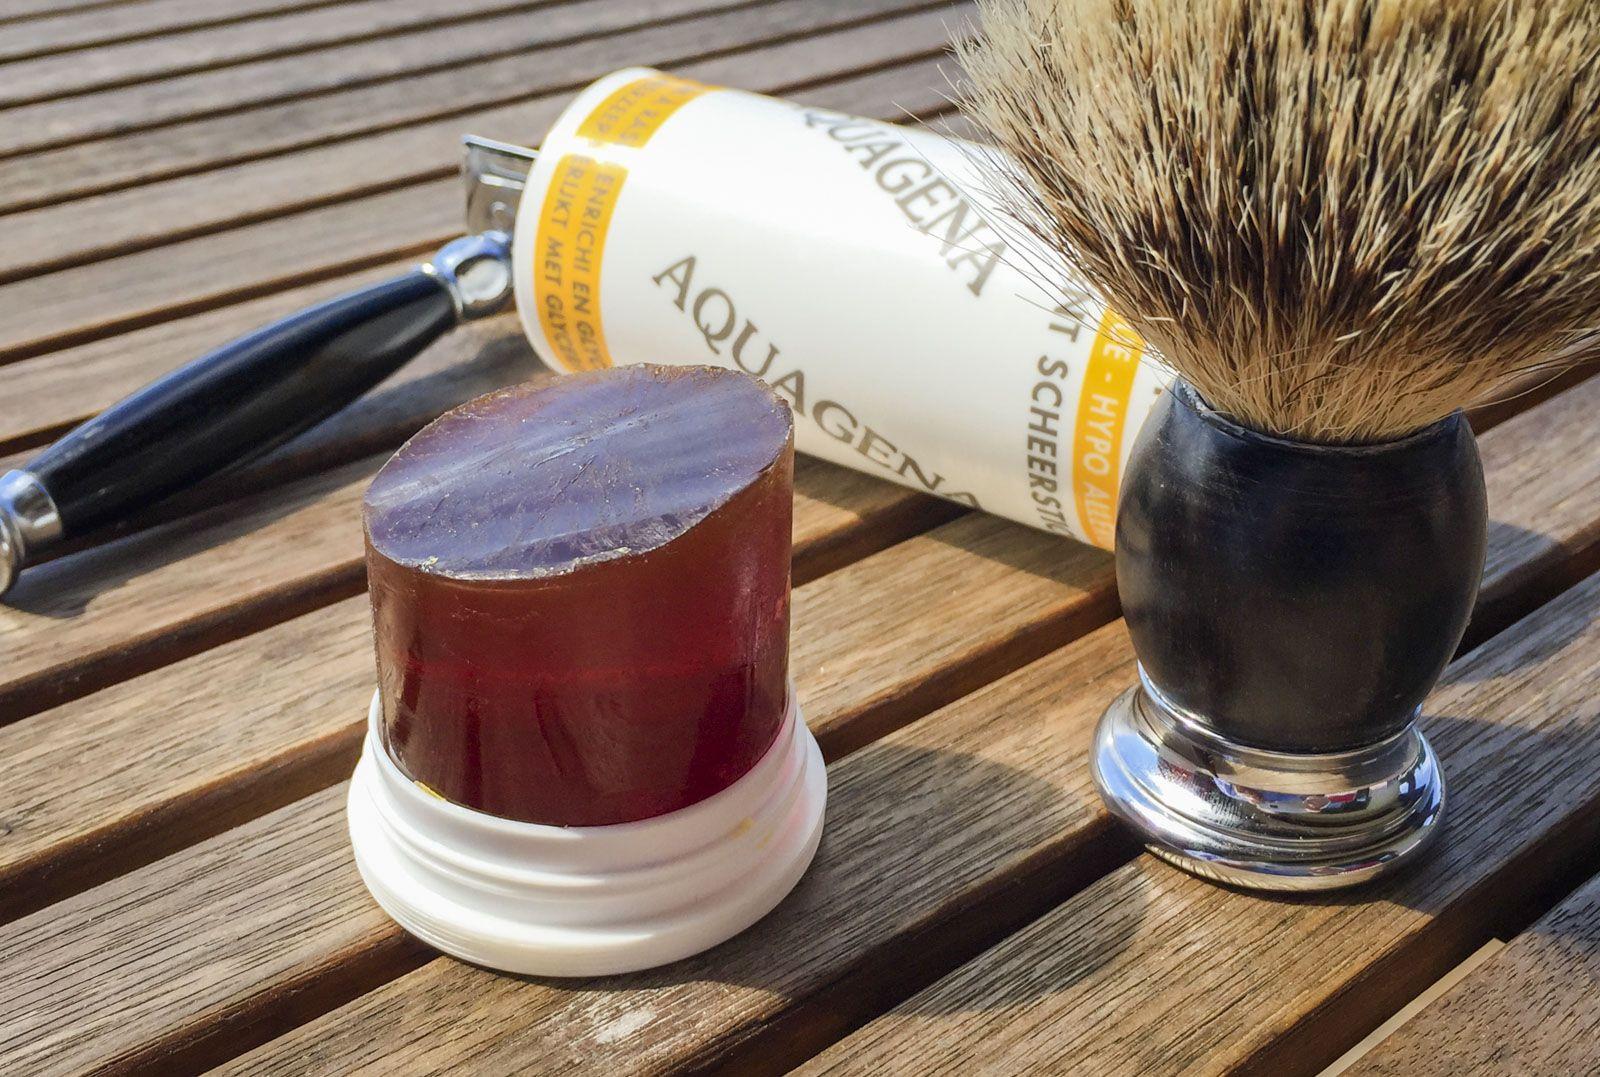 You are currently viewing Lab. Ed. Fromont Aquagena Shaving Stick – recenzja sztyftu do golenia